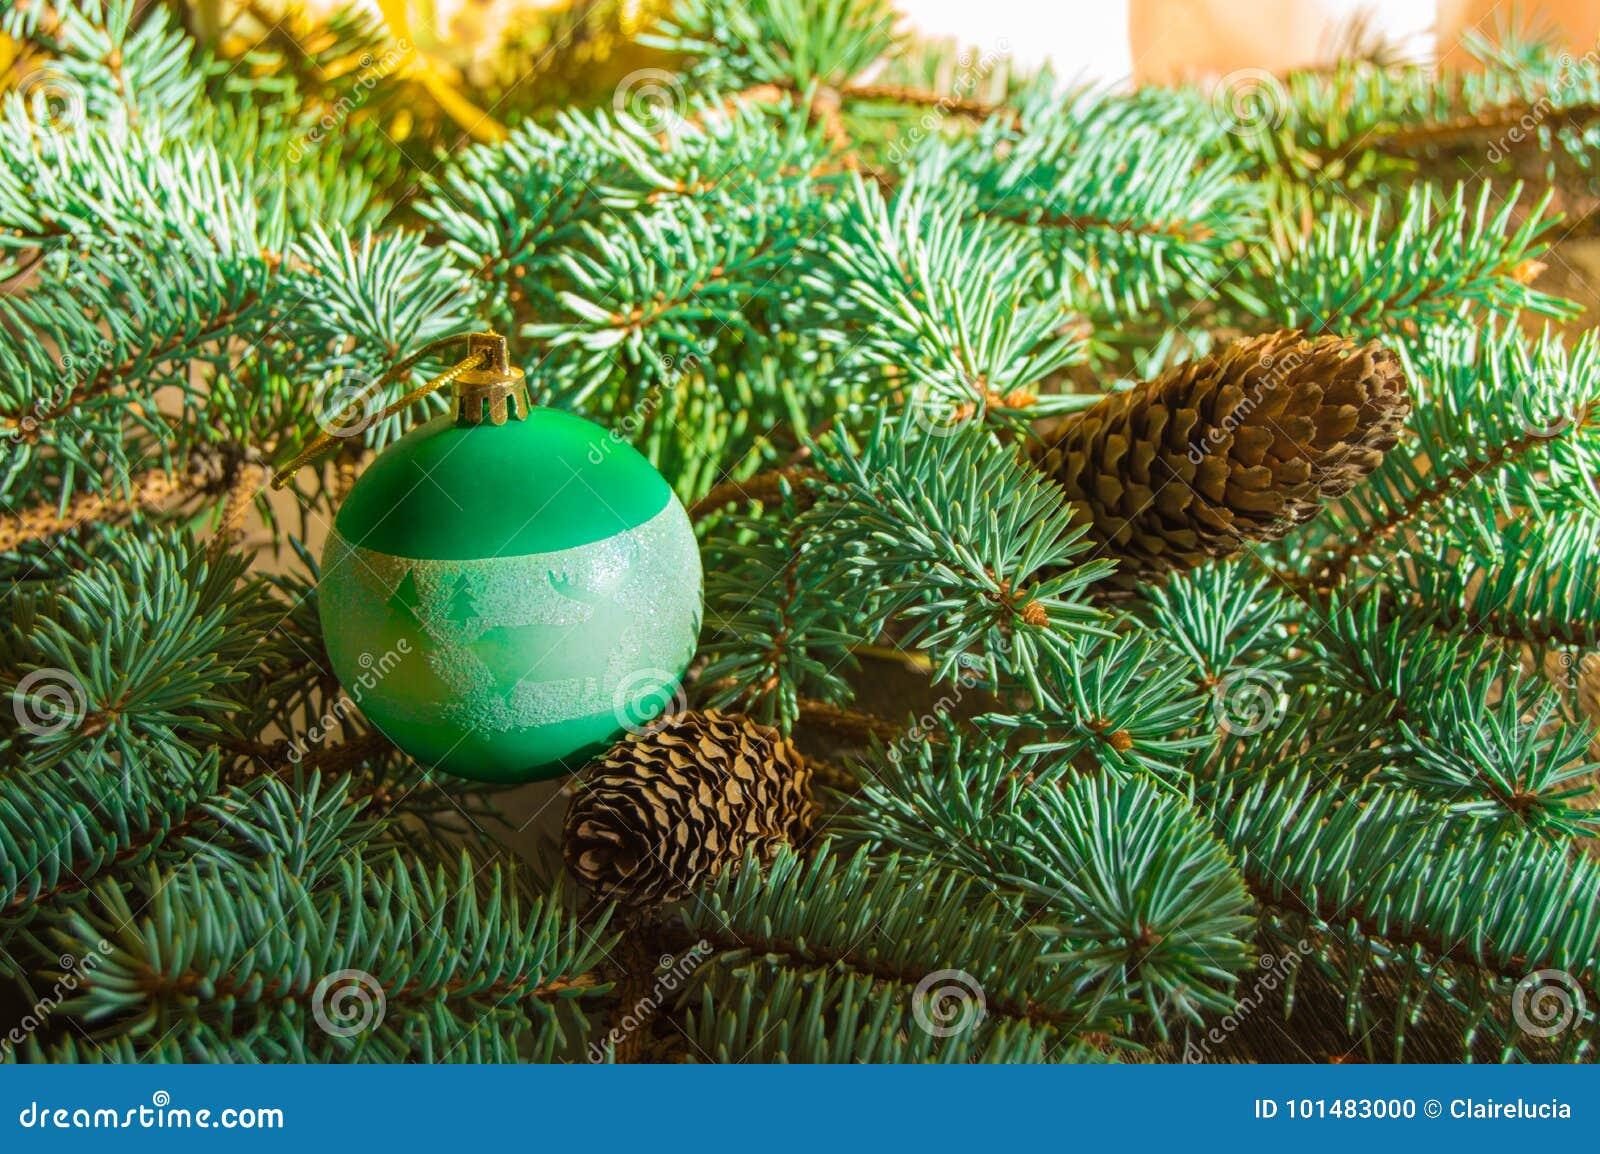 Beautiful Christmas Background Design.Beautiful Christmas Background With Pine Cones Christmas